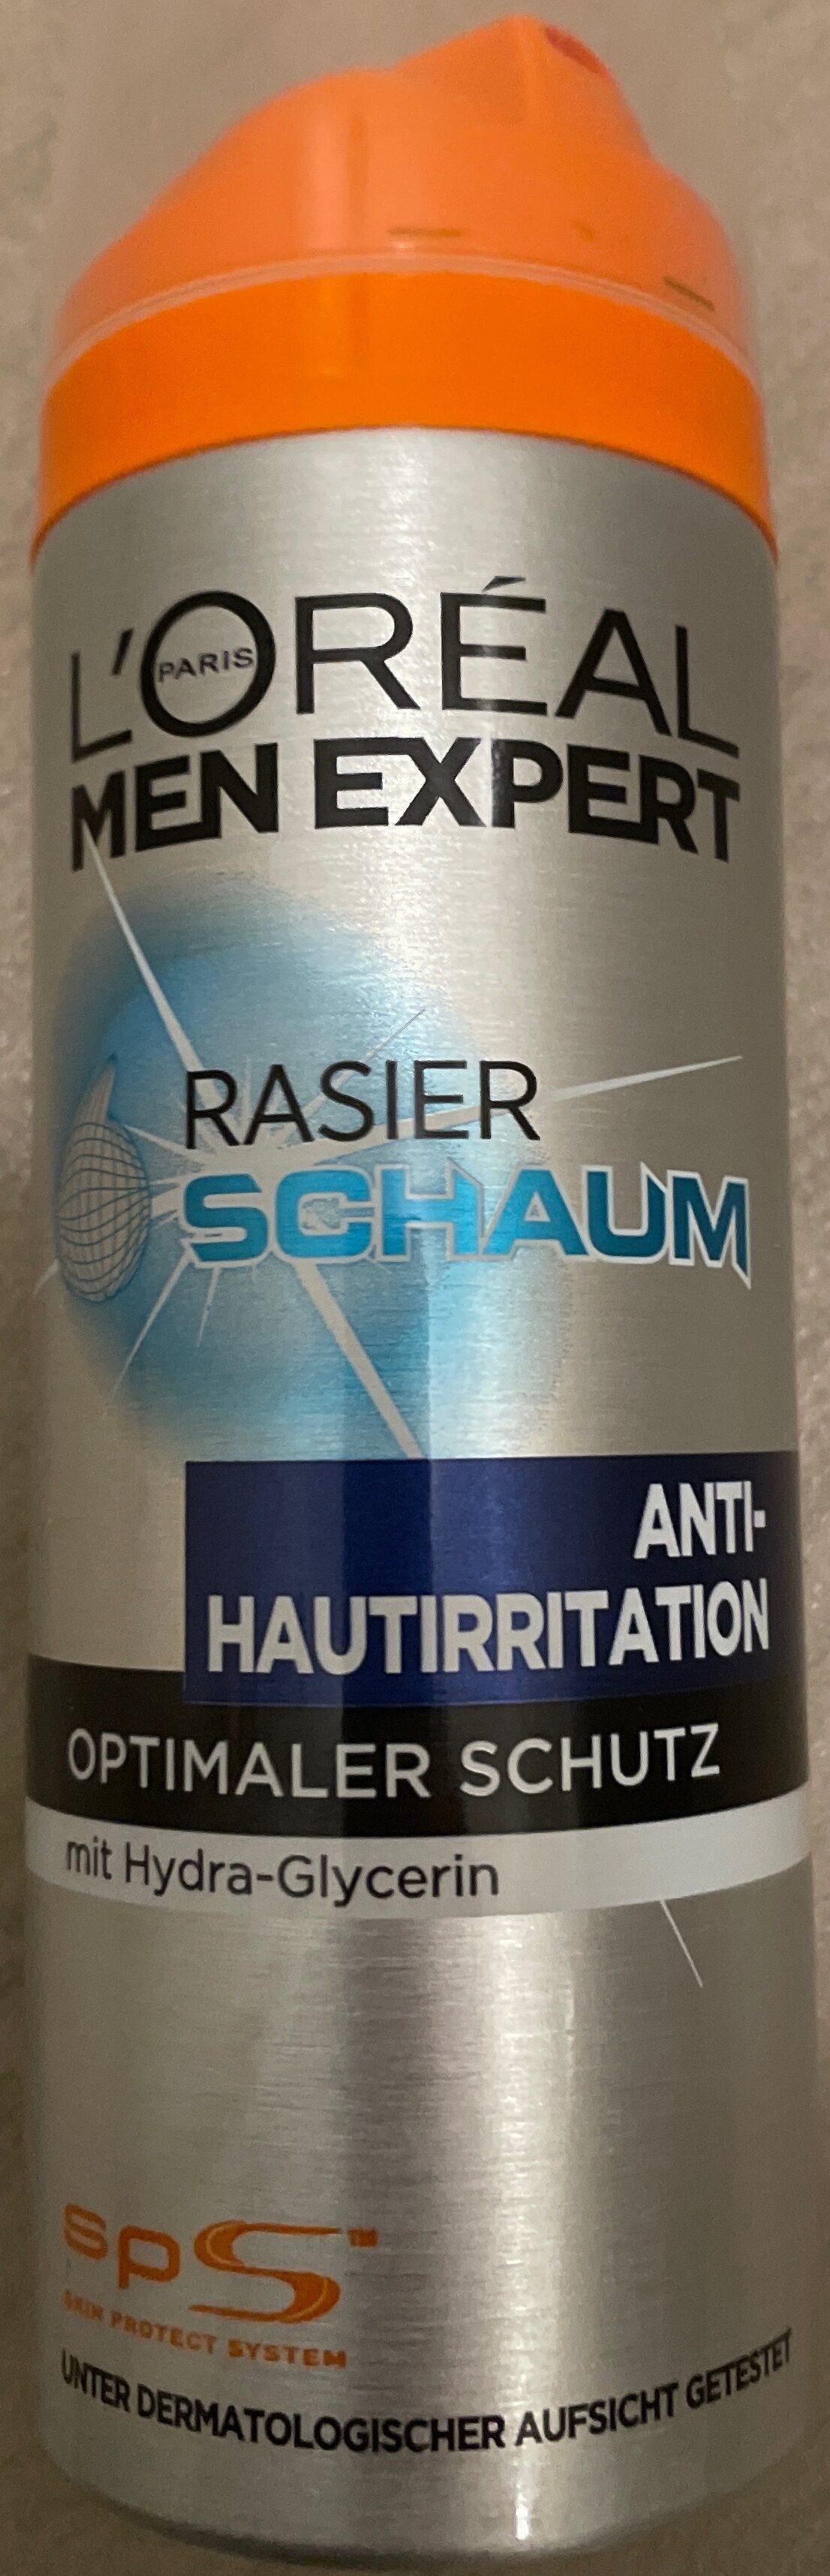 Rasierschaum - Product - de